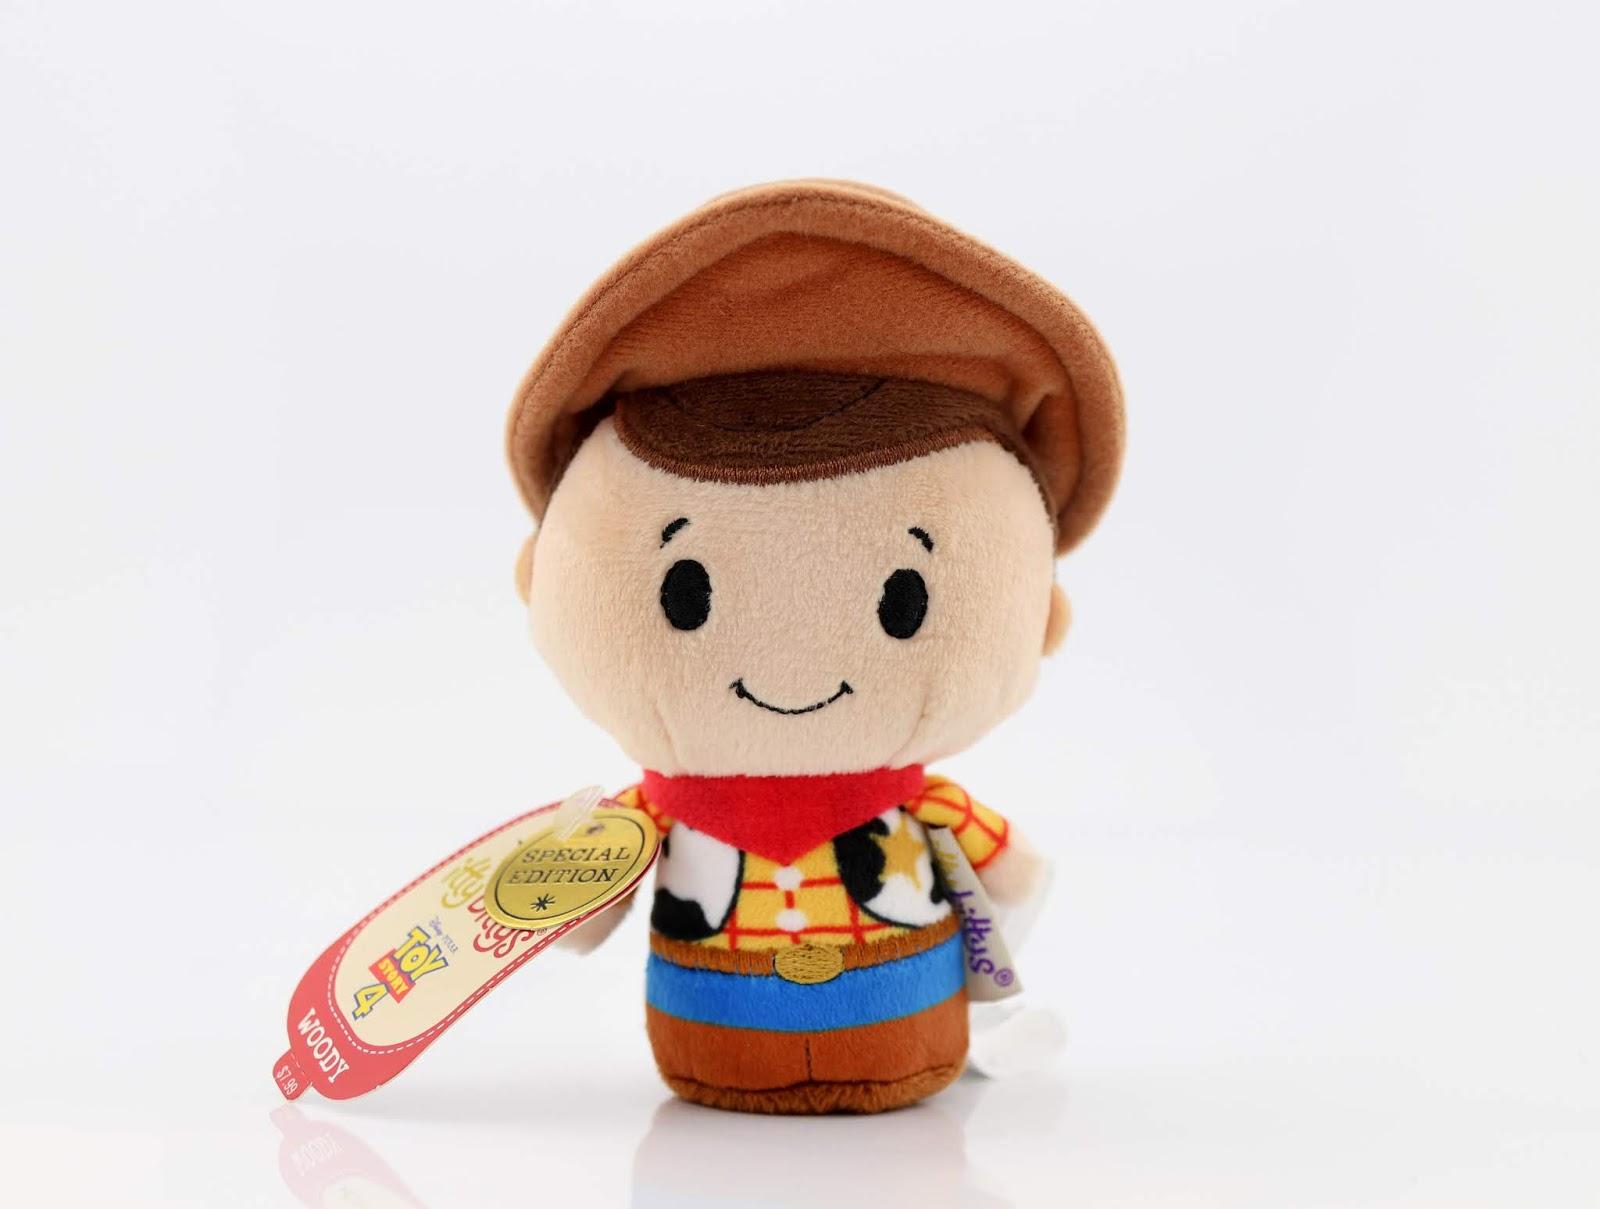 hallmark toy story 4 itty bittys buzz